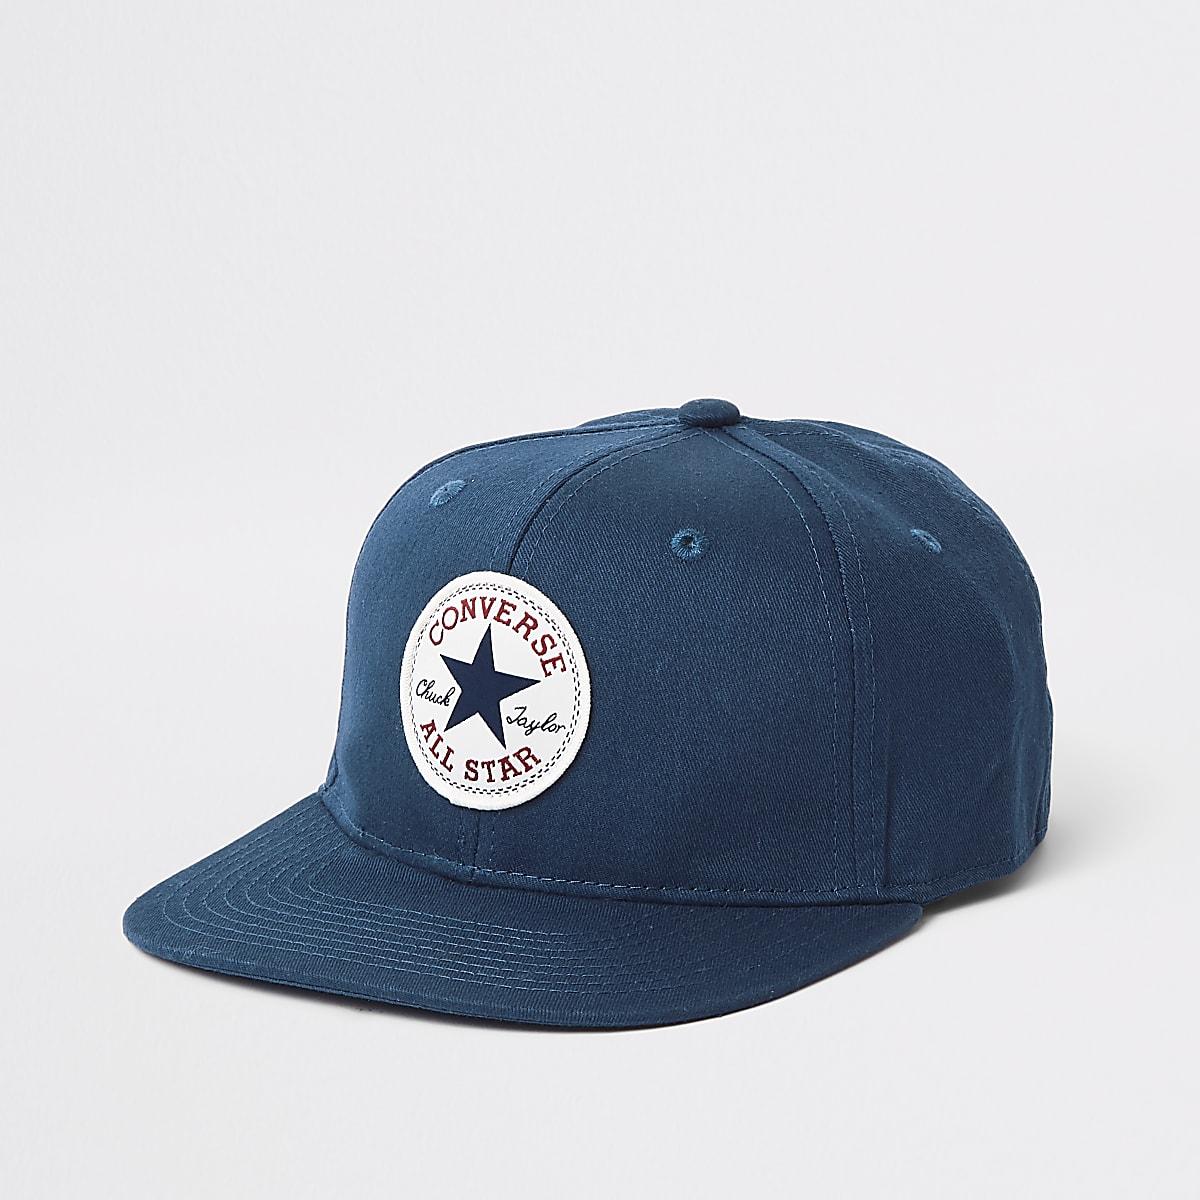 5711a8f4 Boys Converse navy flat peak cap - Hats - Accessories - boys